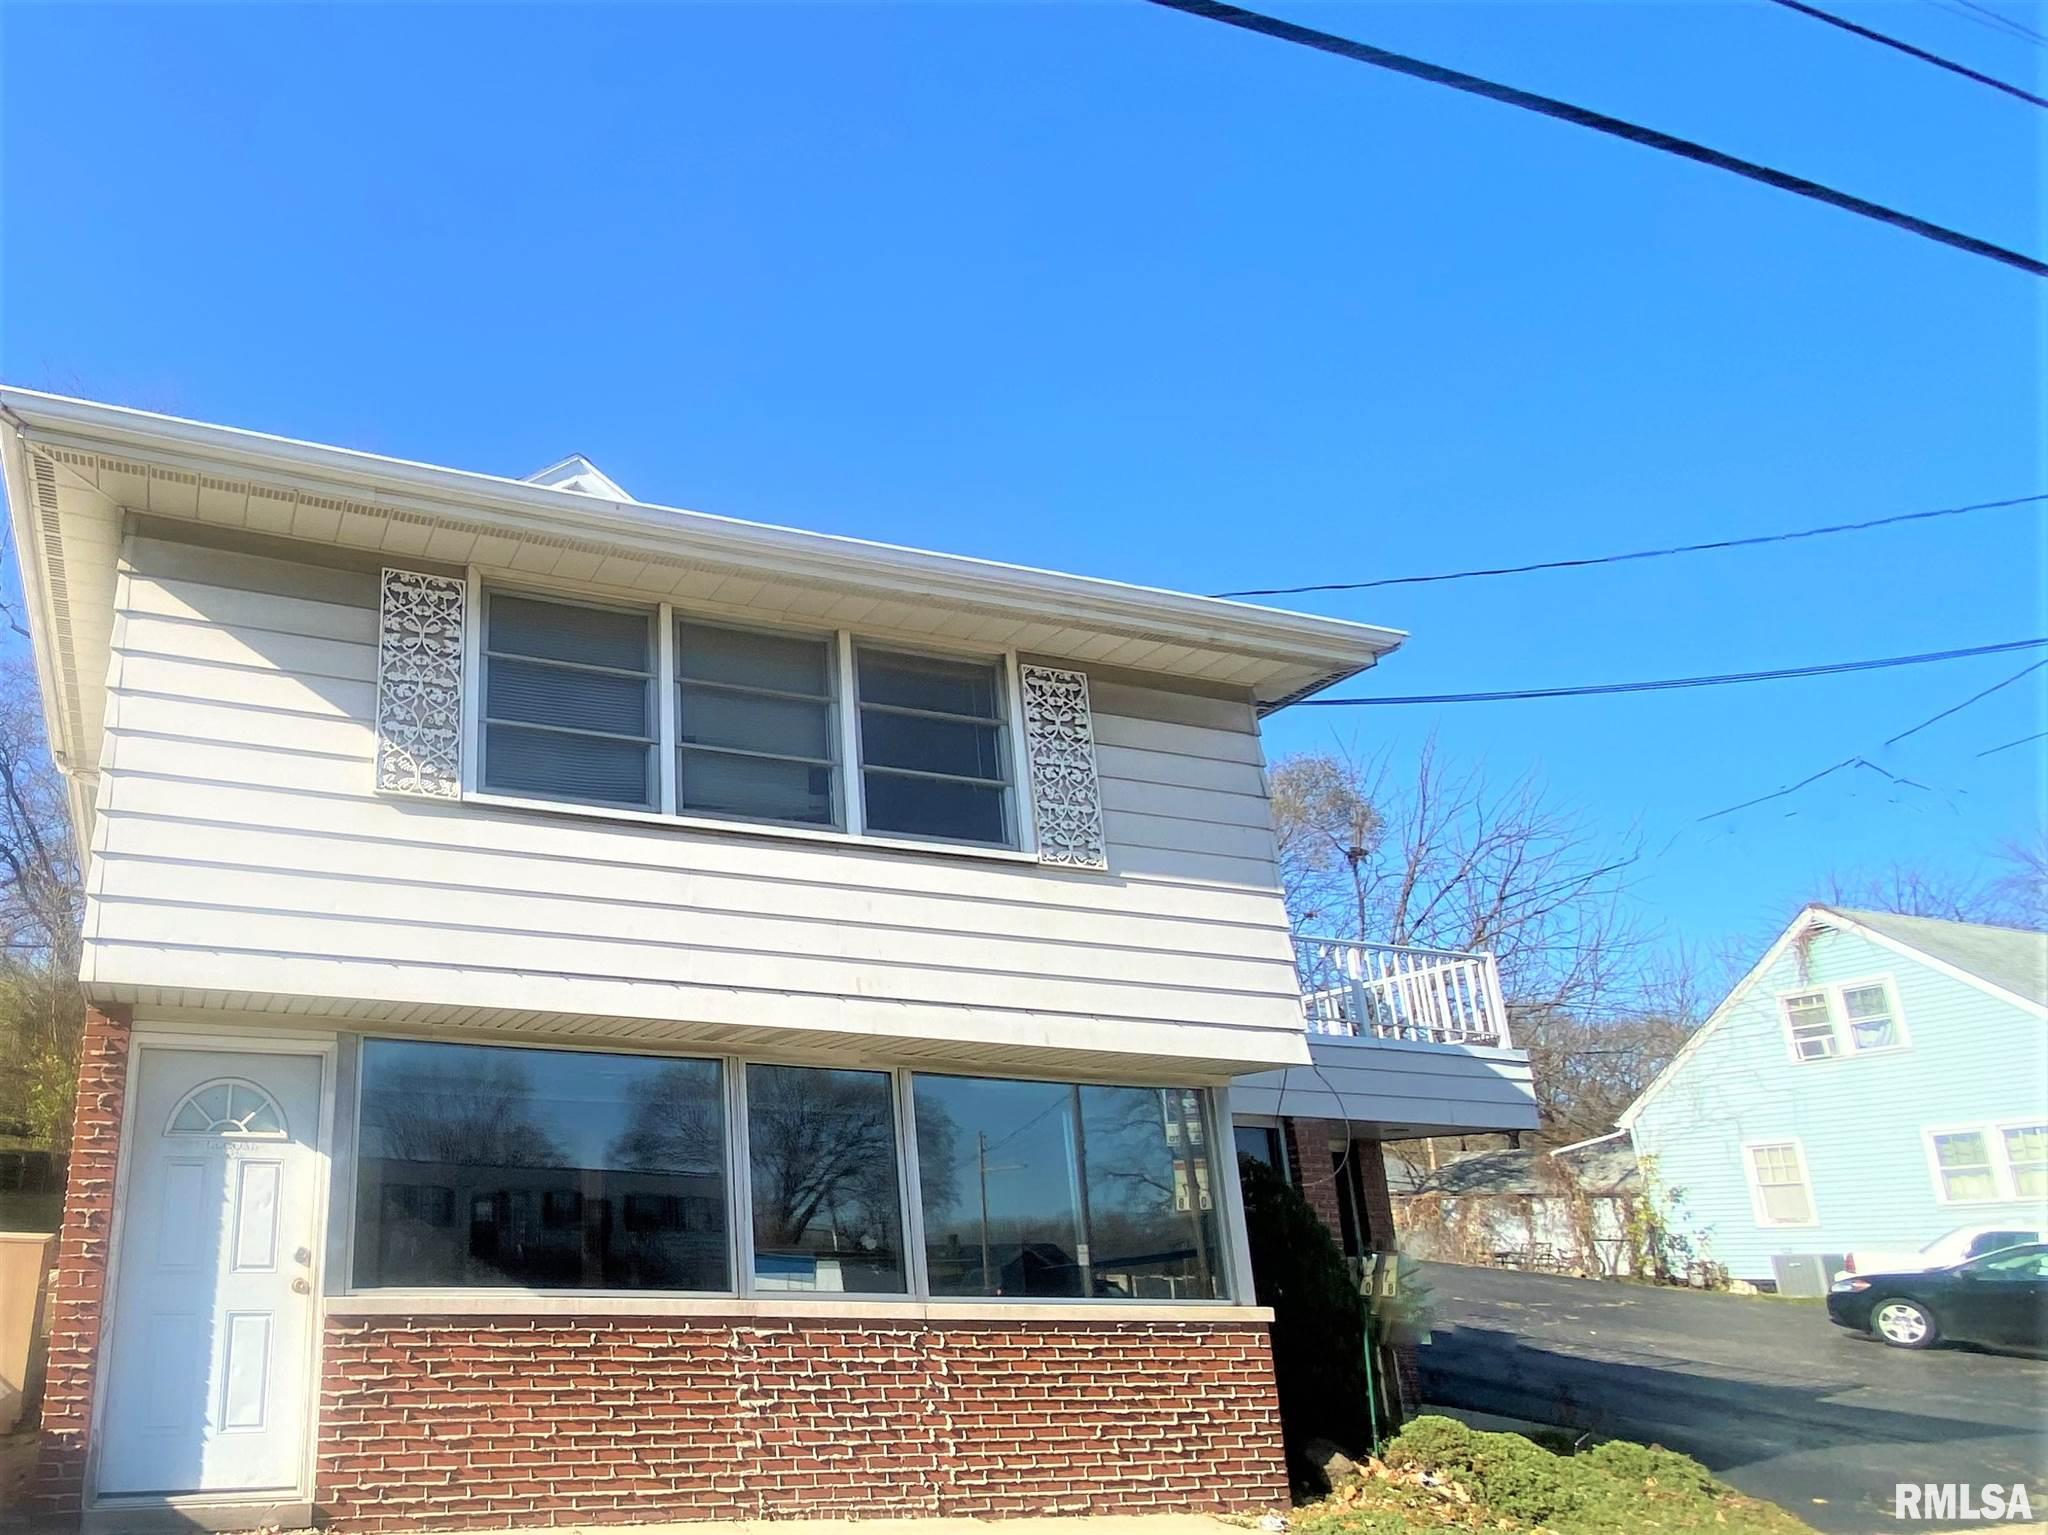 5805 & 5807 ADAMS Property Photo - Bartonville, IL real estate listing